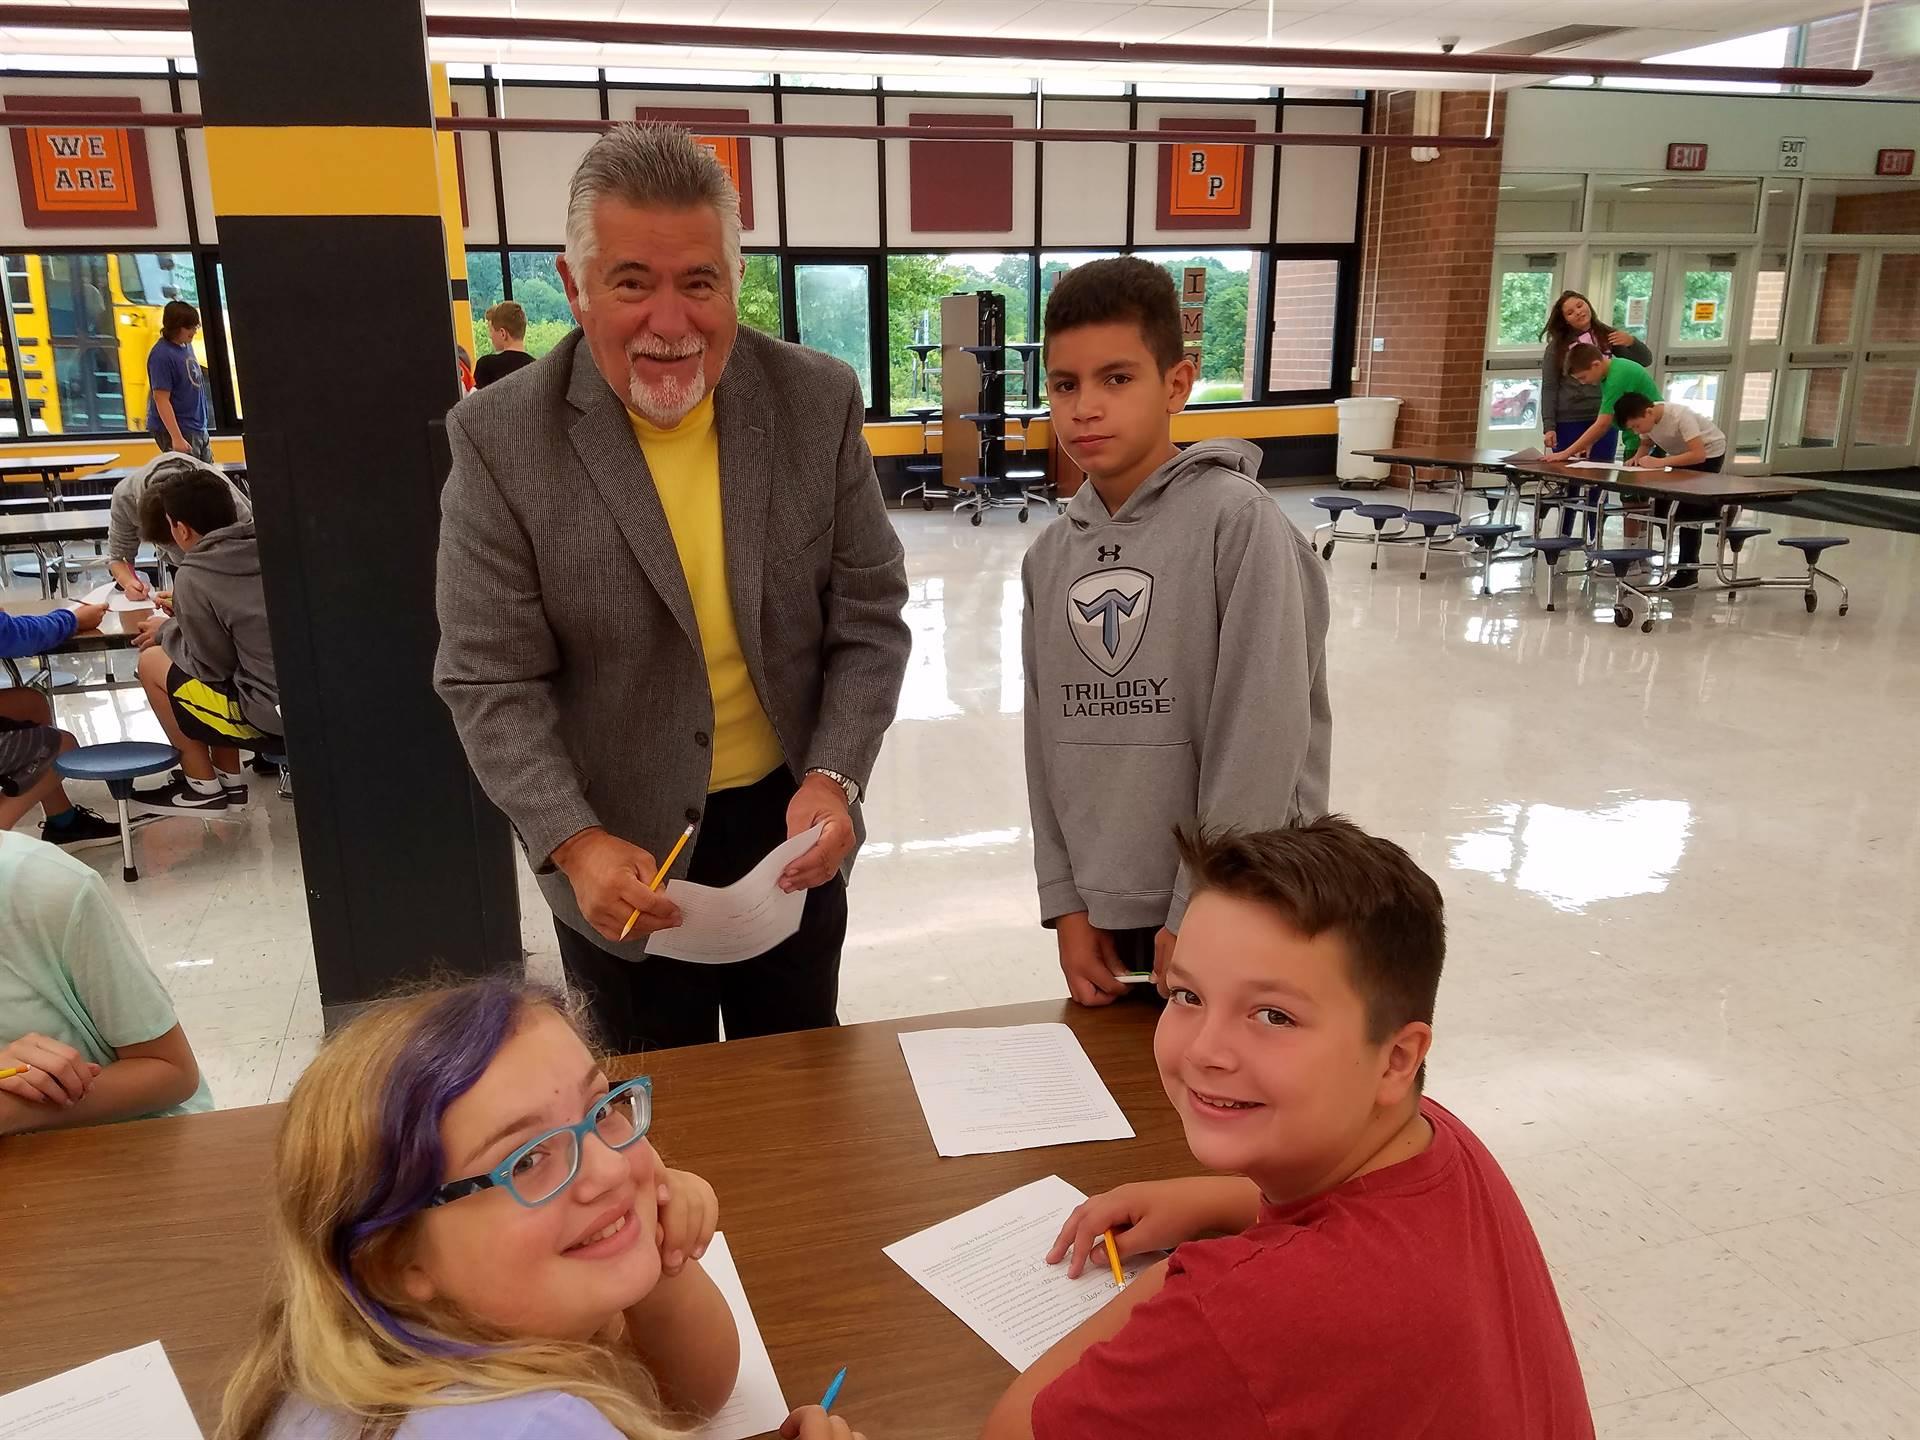 Mayor Jack Allen visited Team 7C's first team day